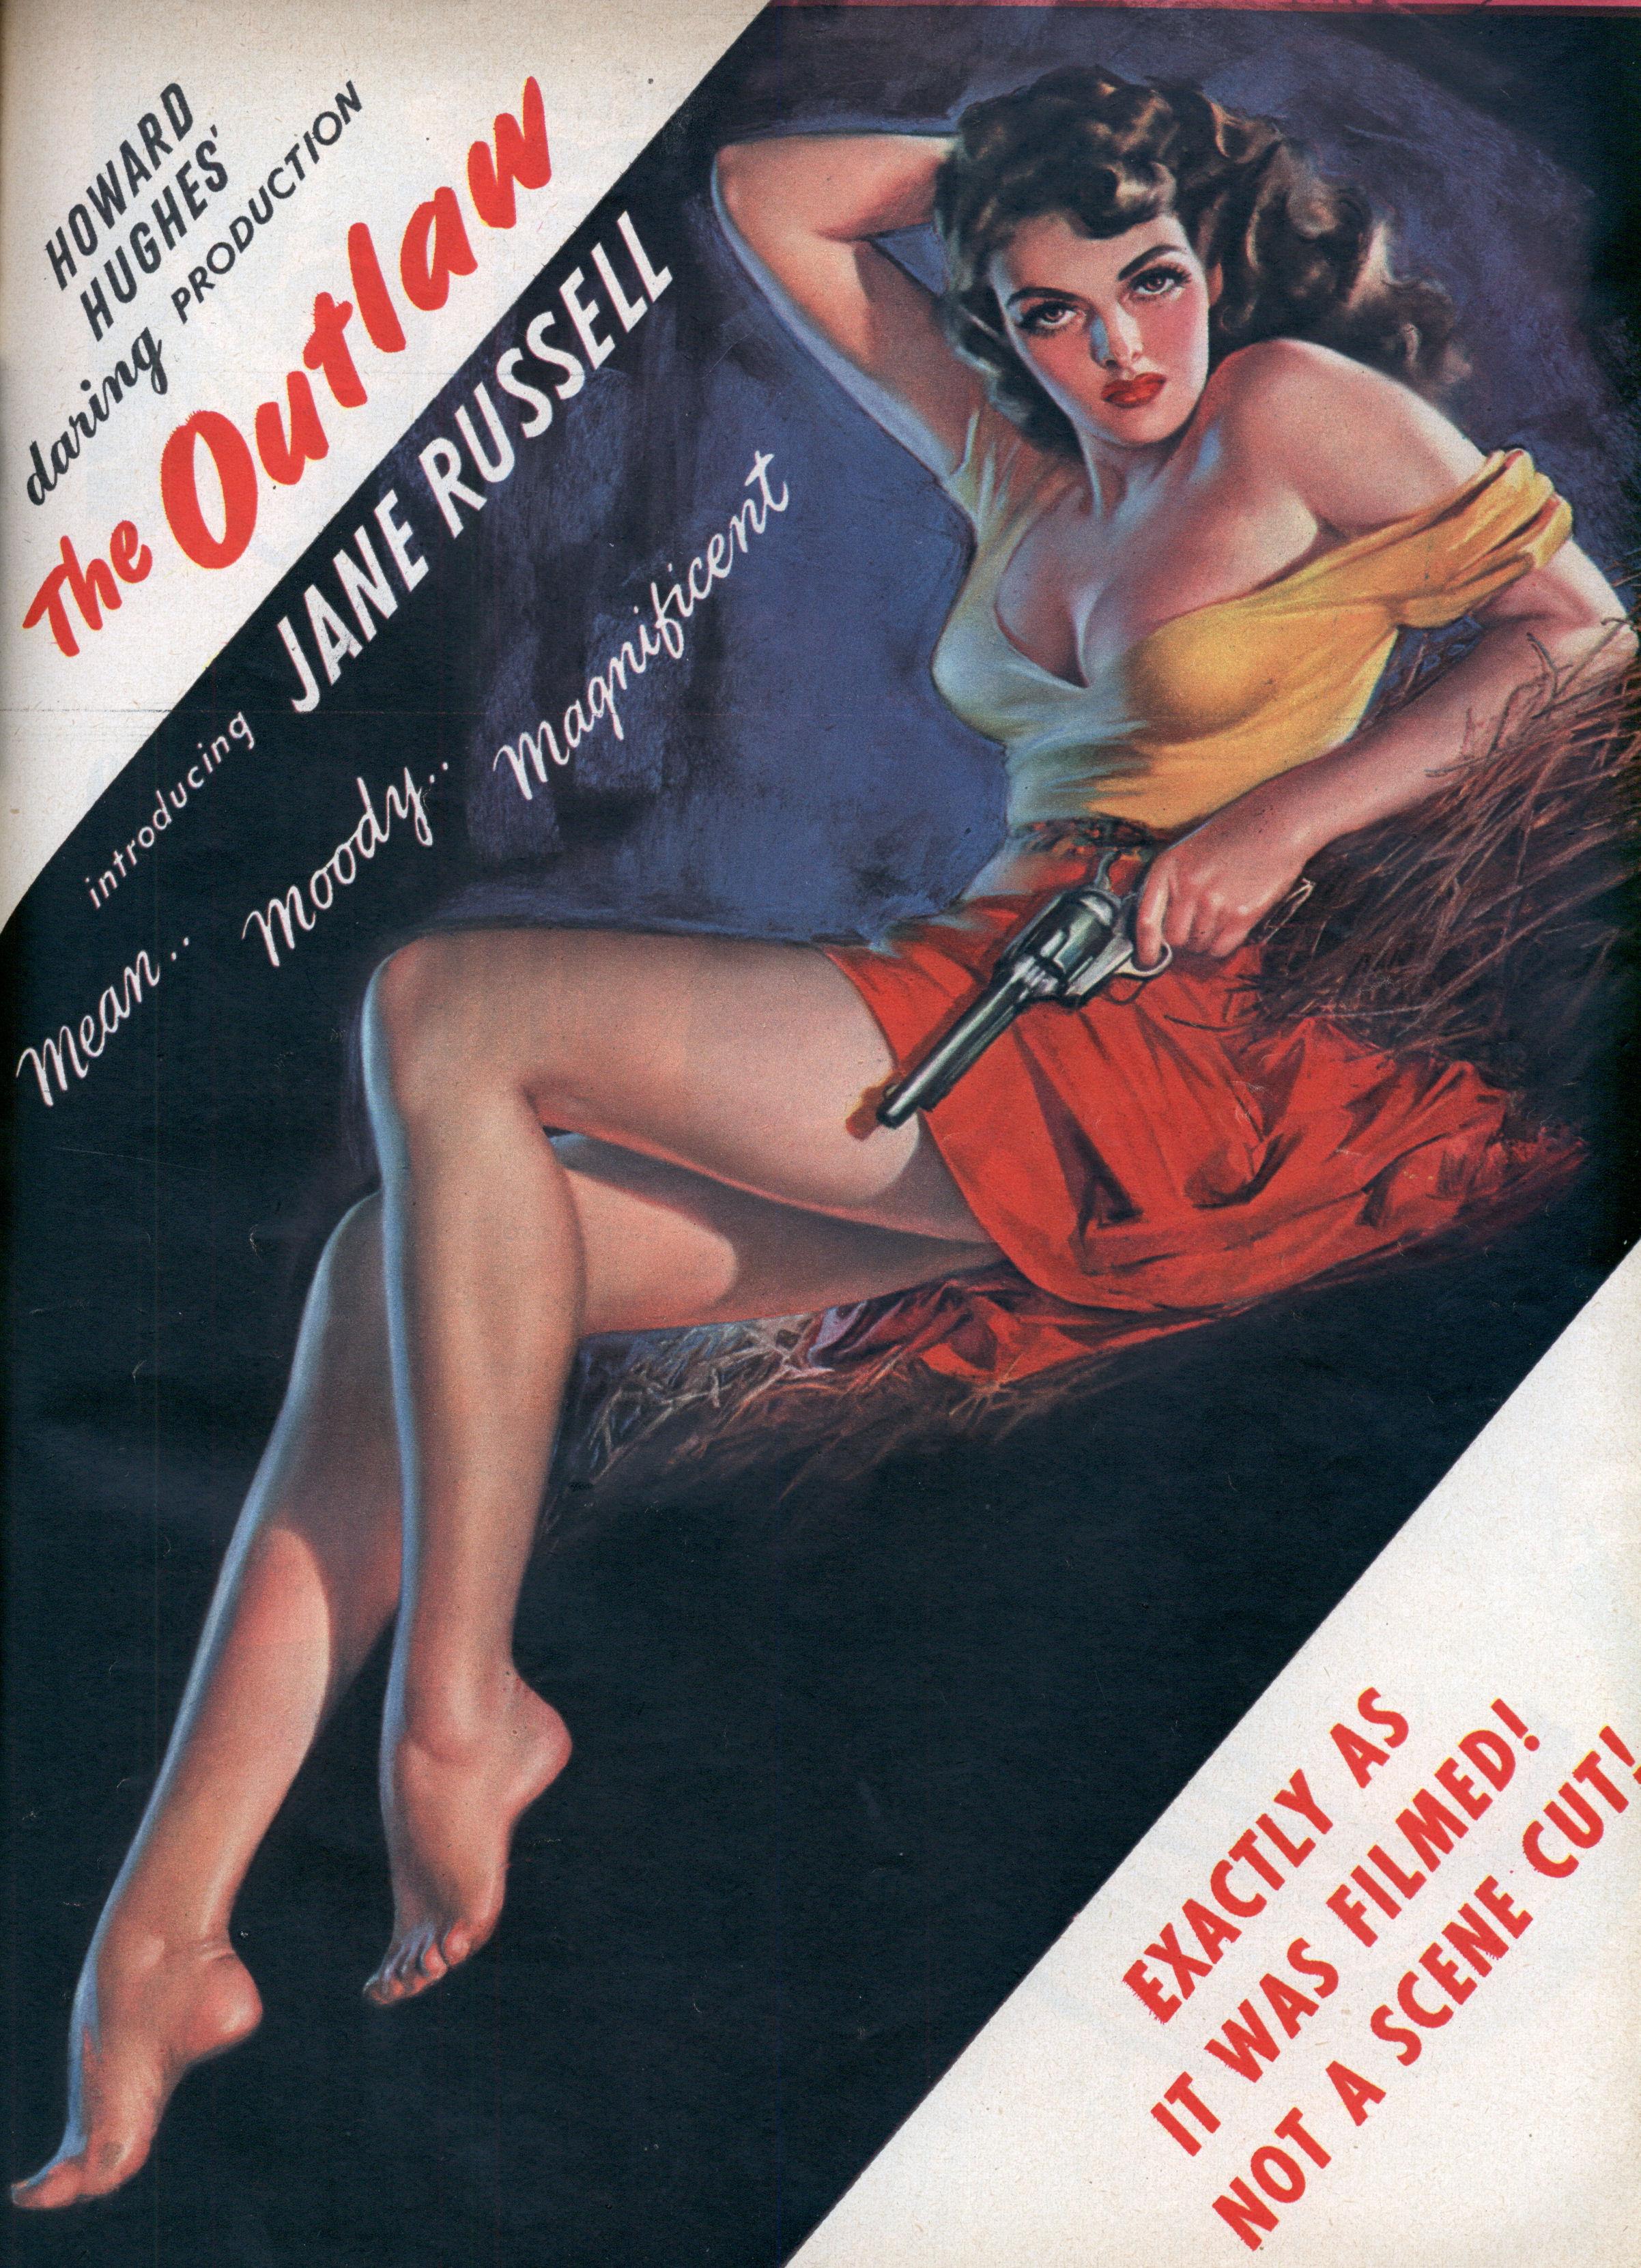 http://blog.modernmechanix.com/mags/True/3-1955/the_outlaw/the_outlaw_1.jpg